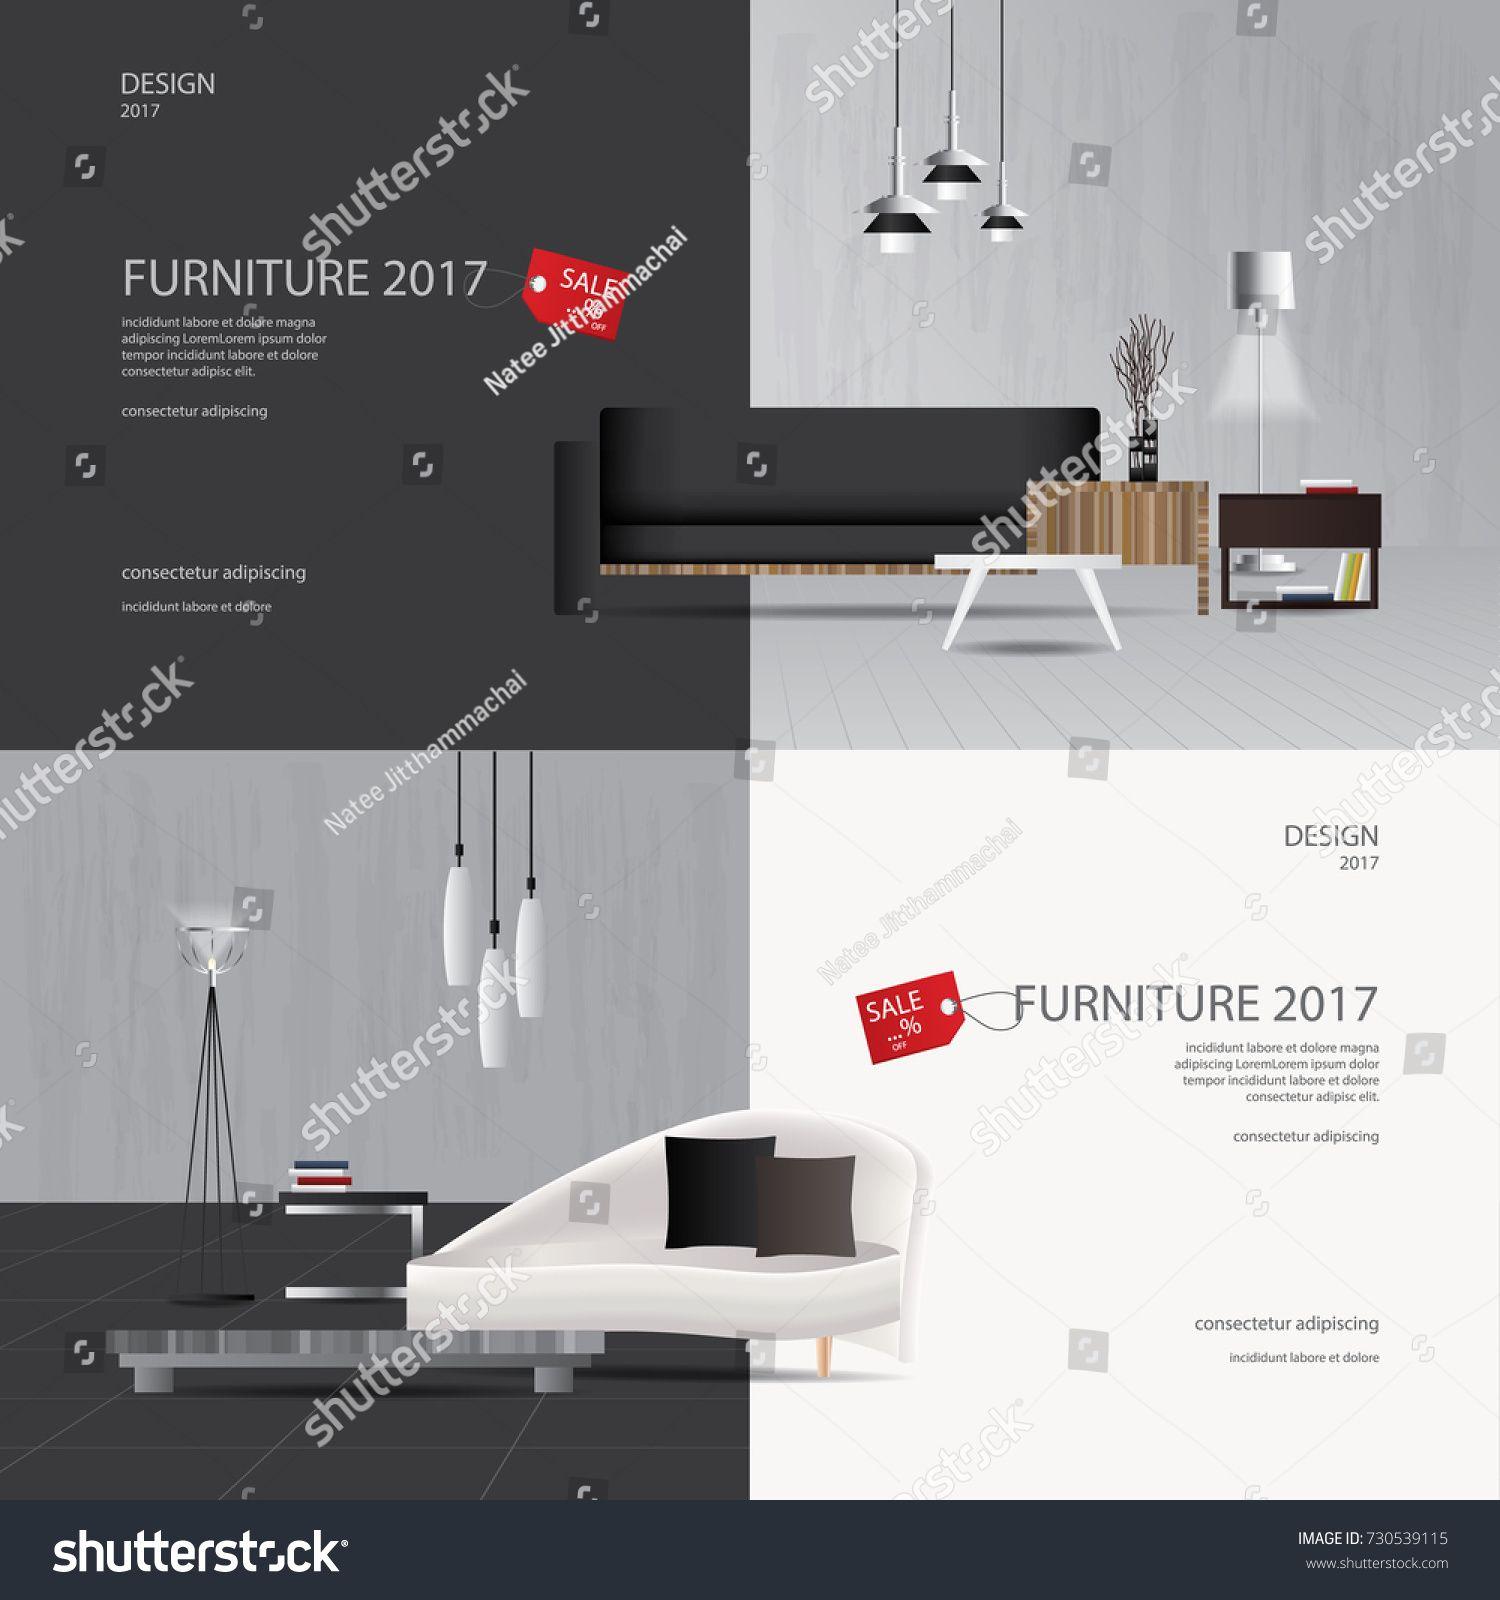 2 Banner Furniture Sale Design Template Vector Illustrationsale